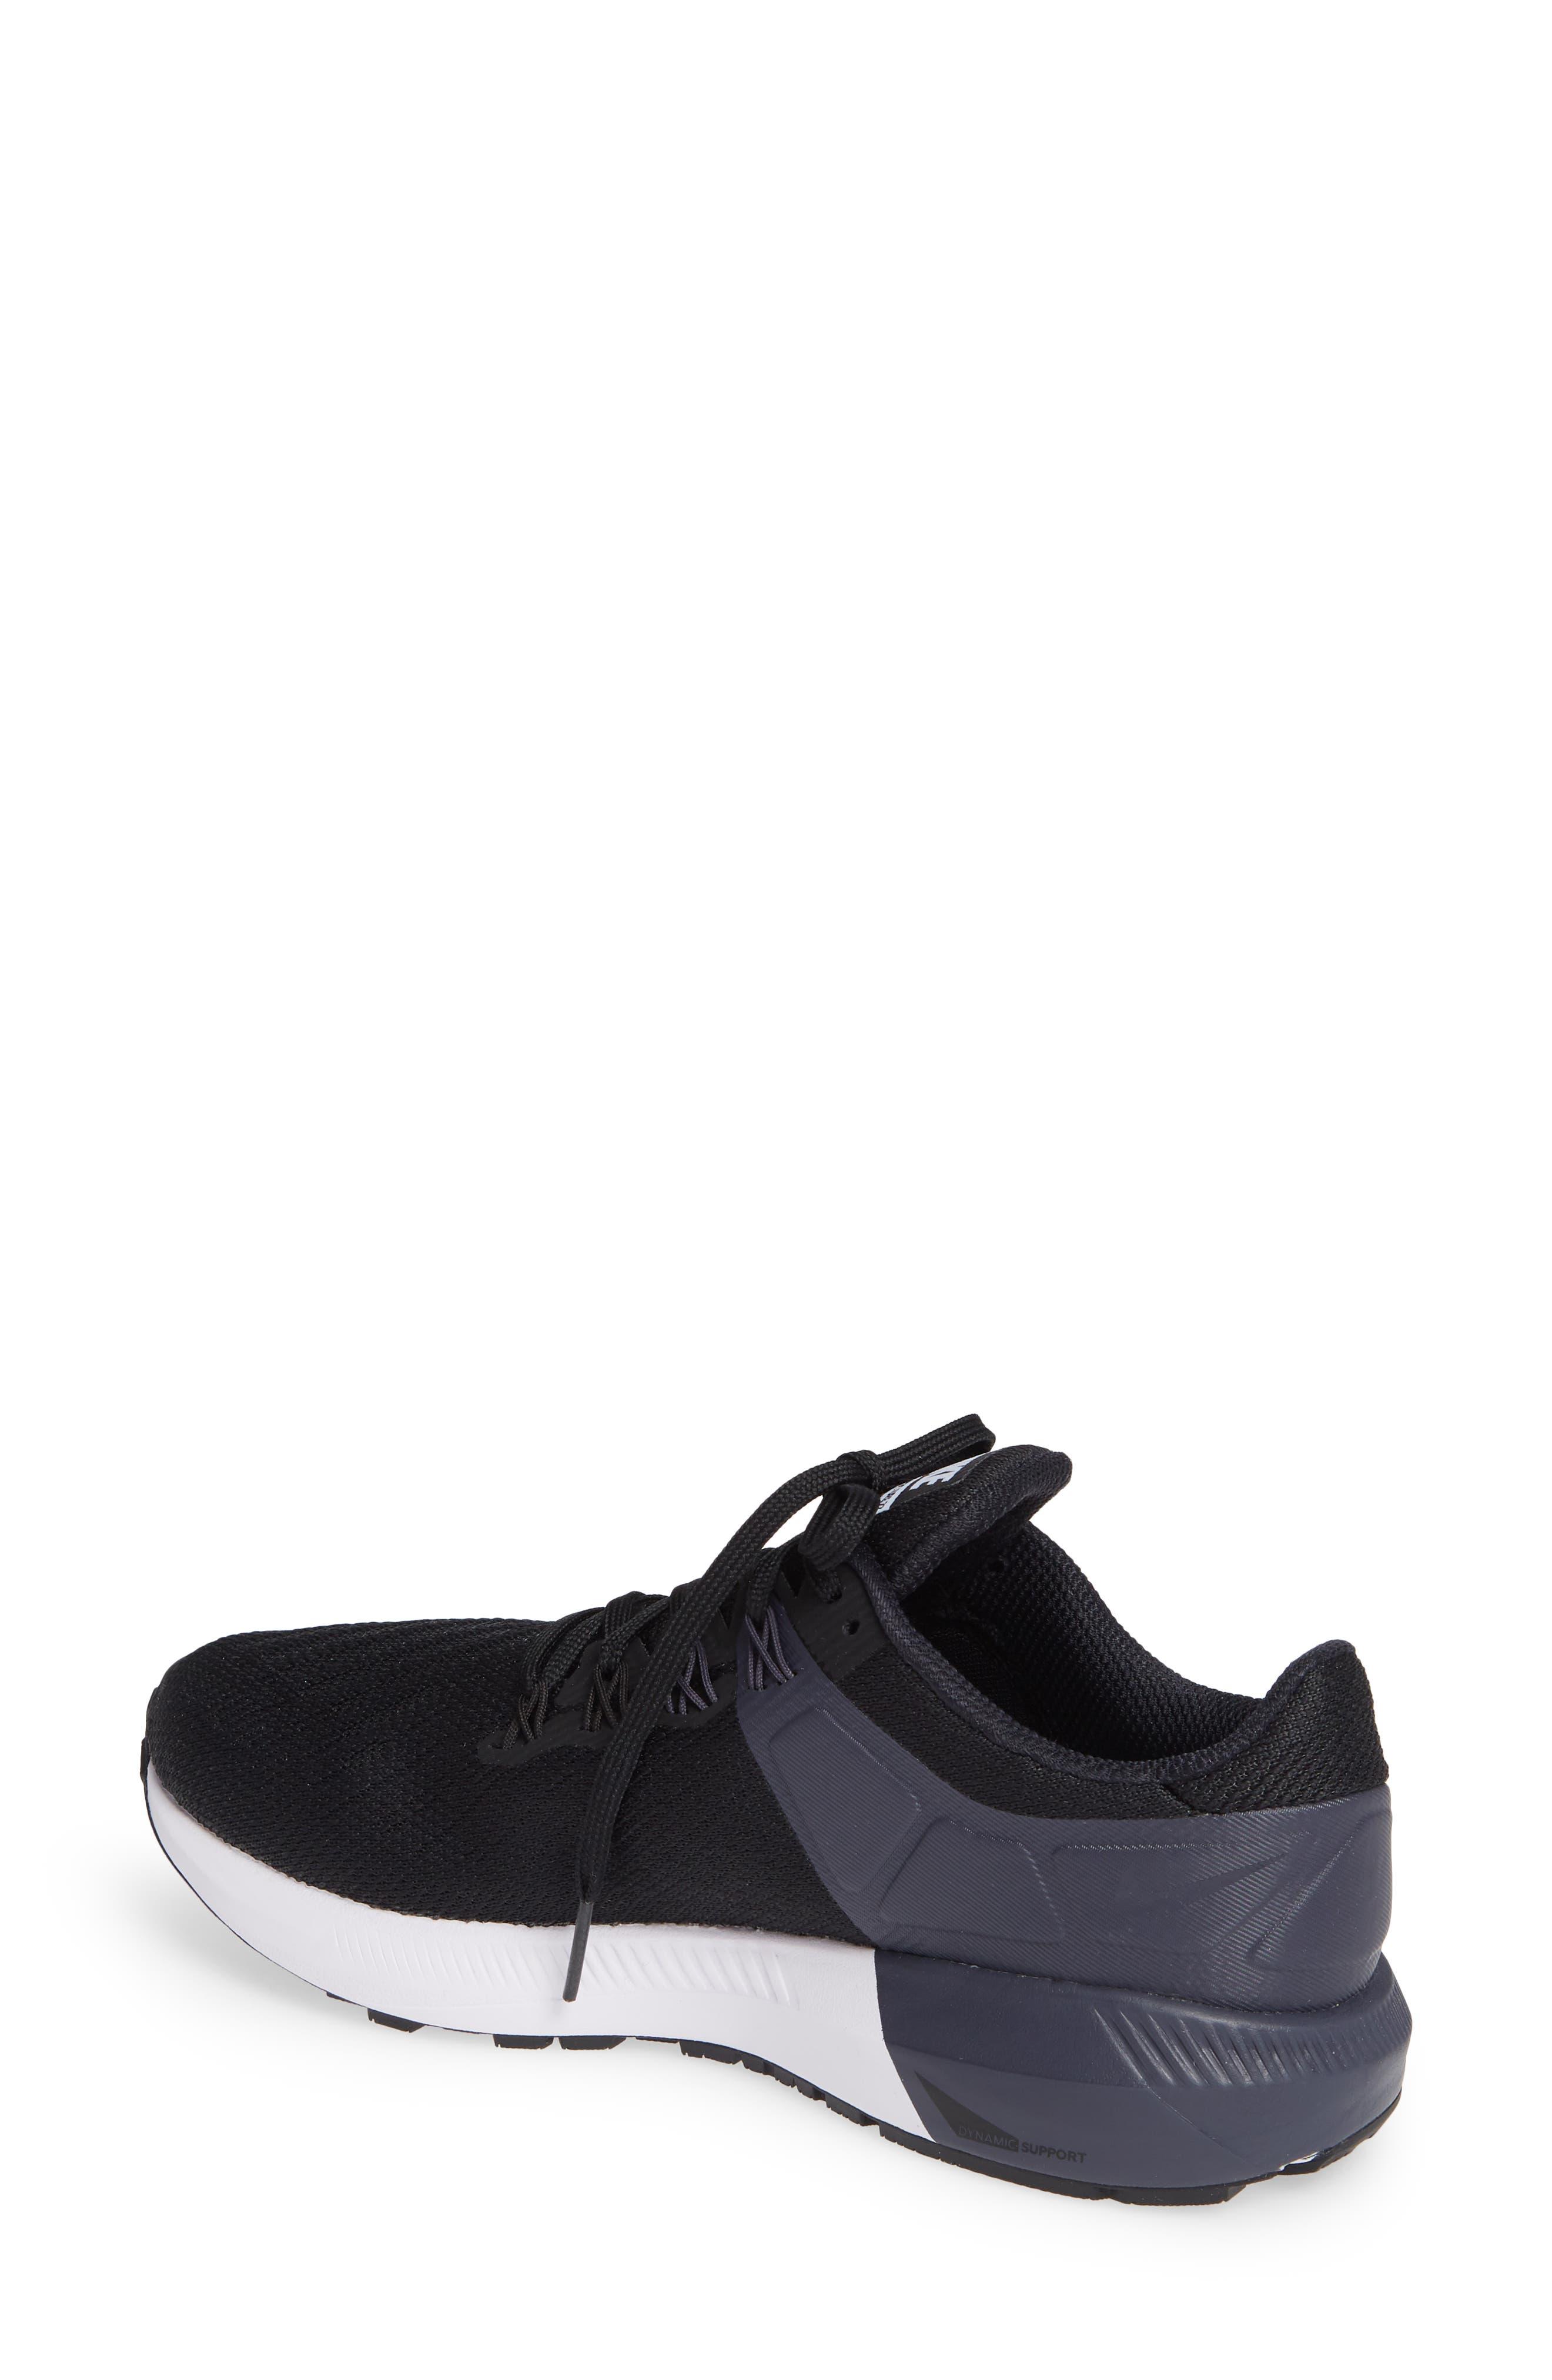 Air Zoom Structure 22 Sneaker,                             Alternate thumbnail 2, color,                             BLACK/ WHITE-GRIDIRON